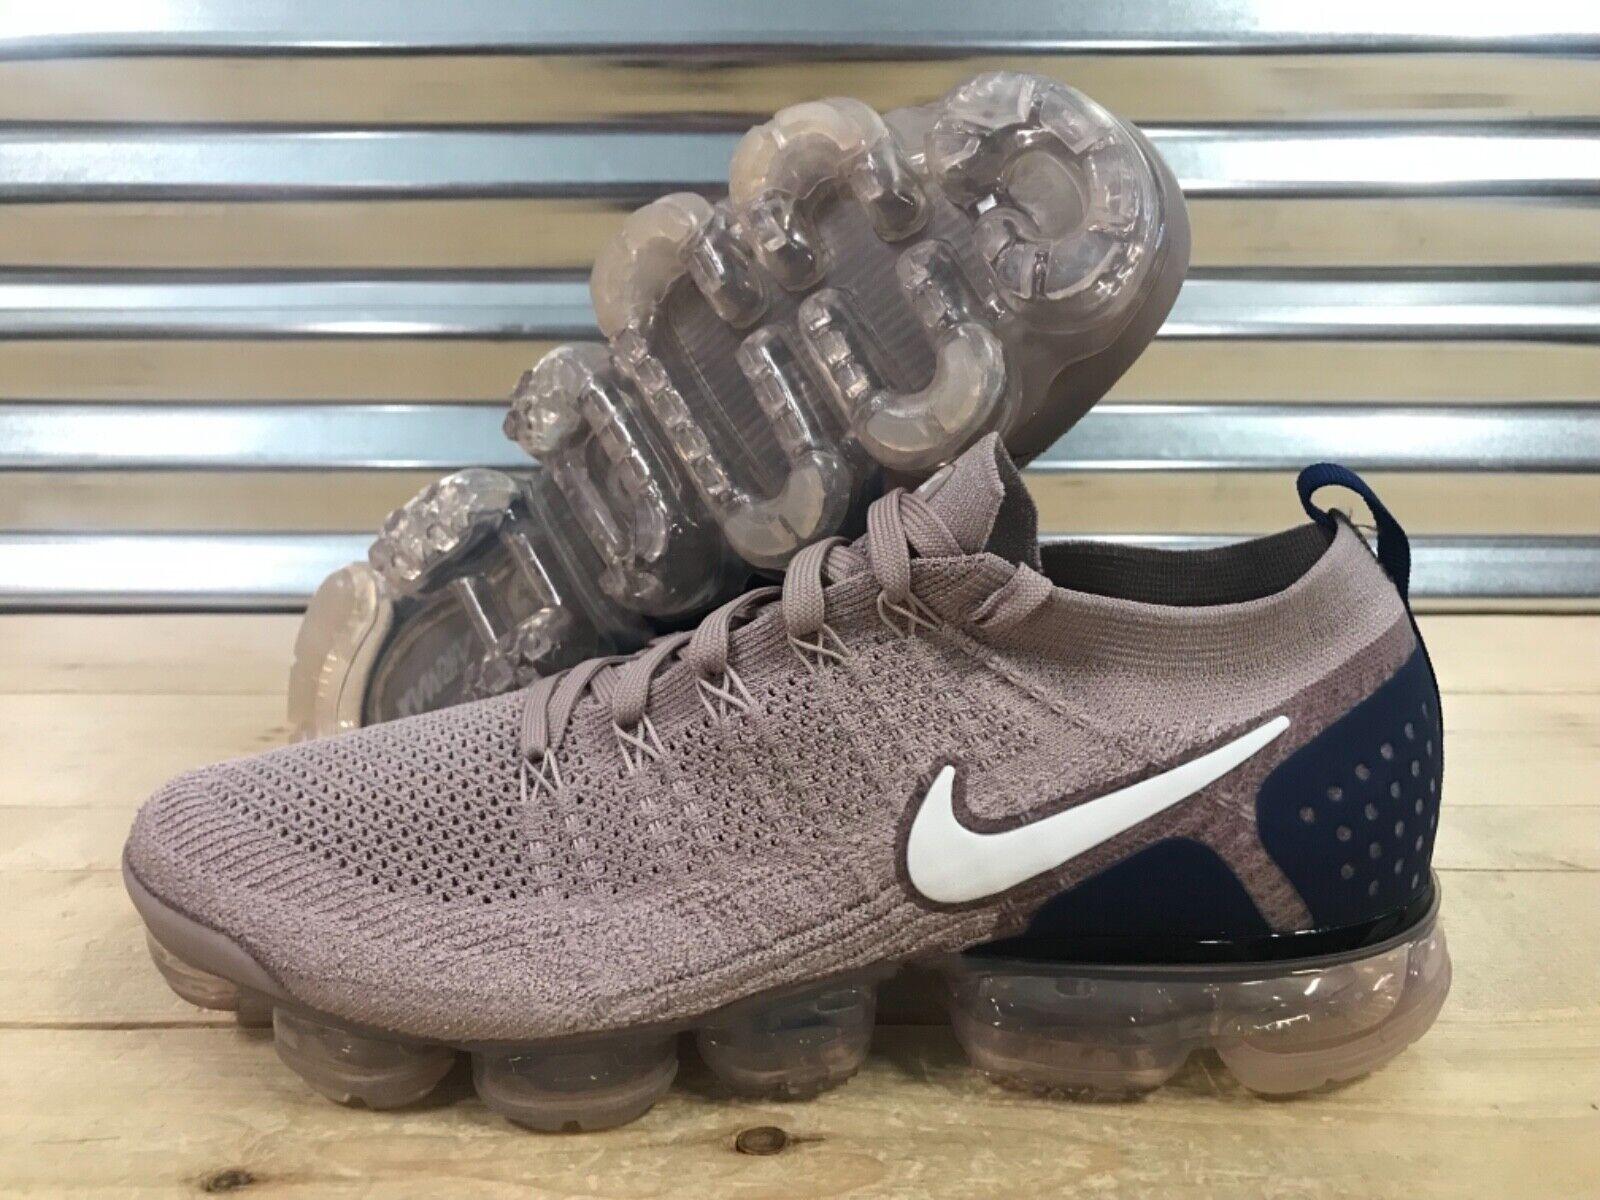 Nike Nike Nike Air Vapormax Flyknit 2 Running scarpe Diffused Taupe blu SZ ( 942842-201 ) 374762